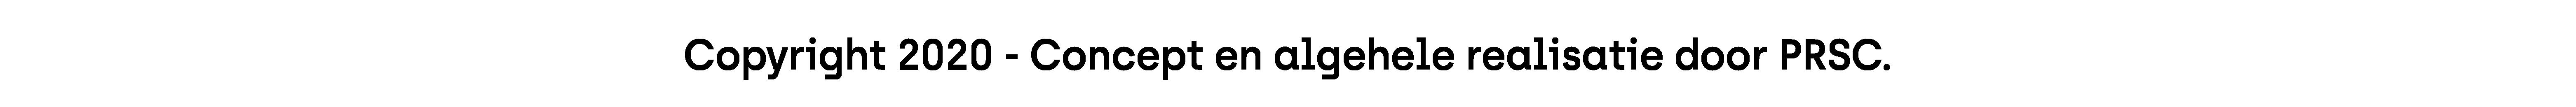 9f51b960-1d12-11eb-911c-eb936e24d1b8.png